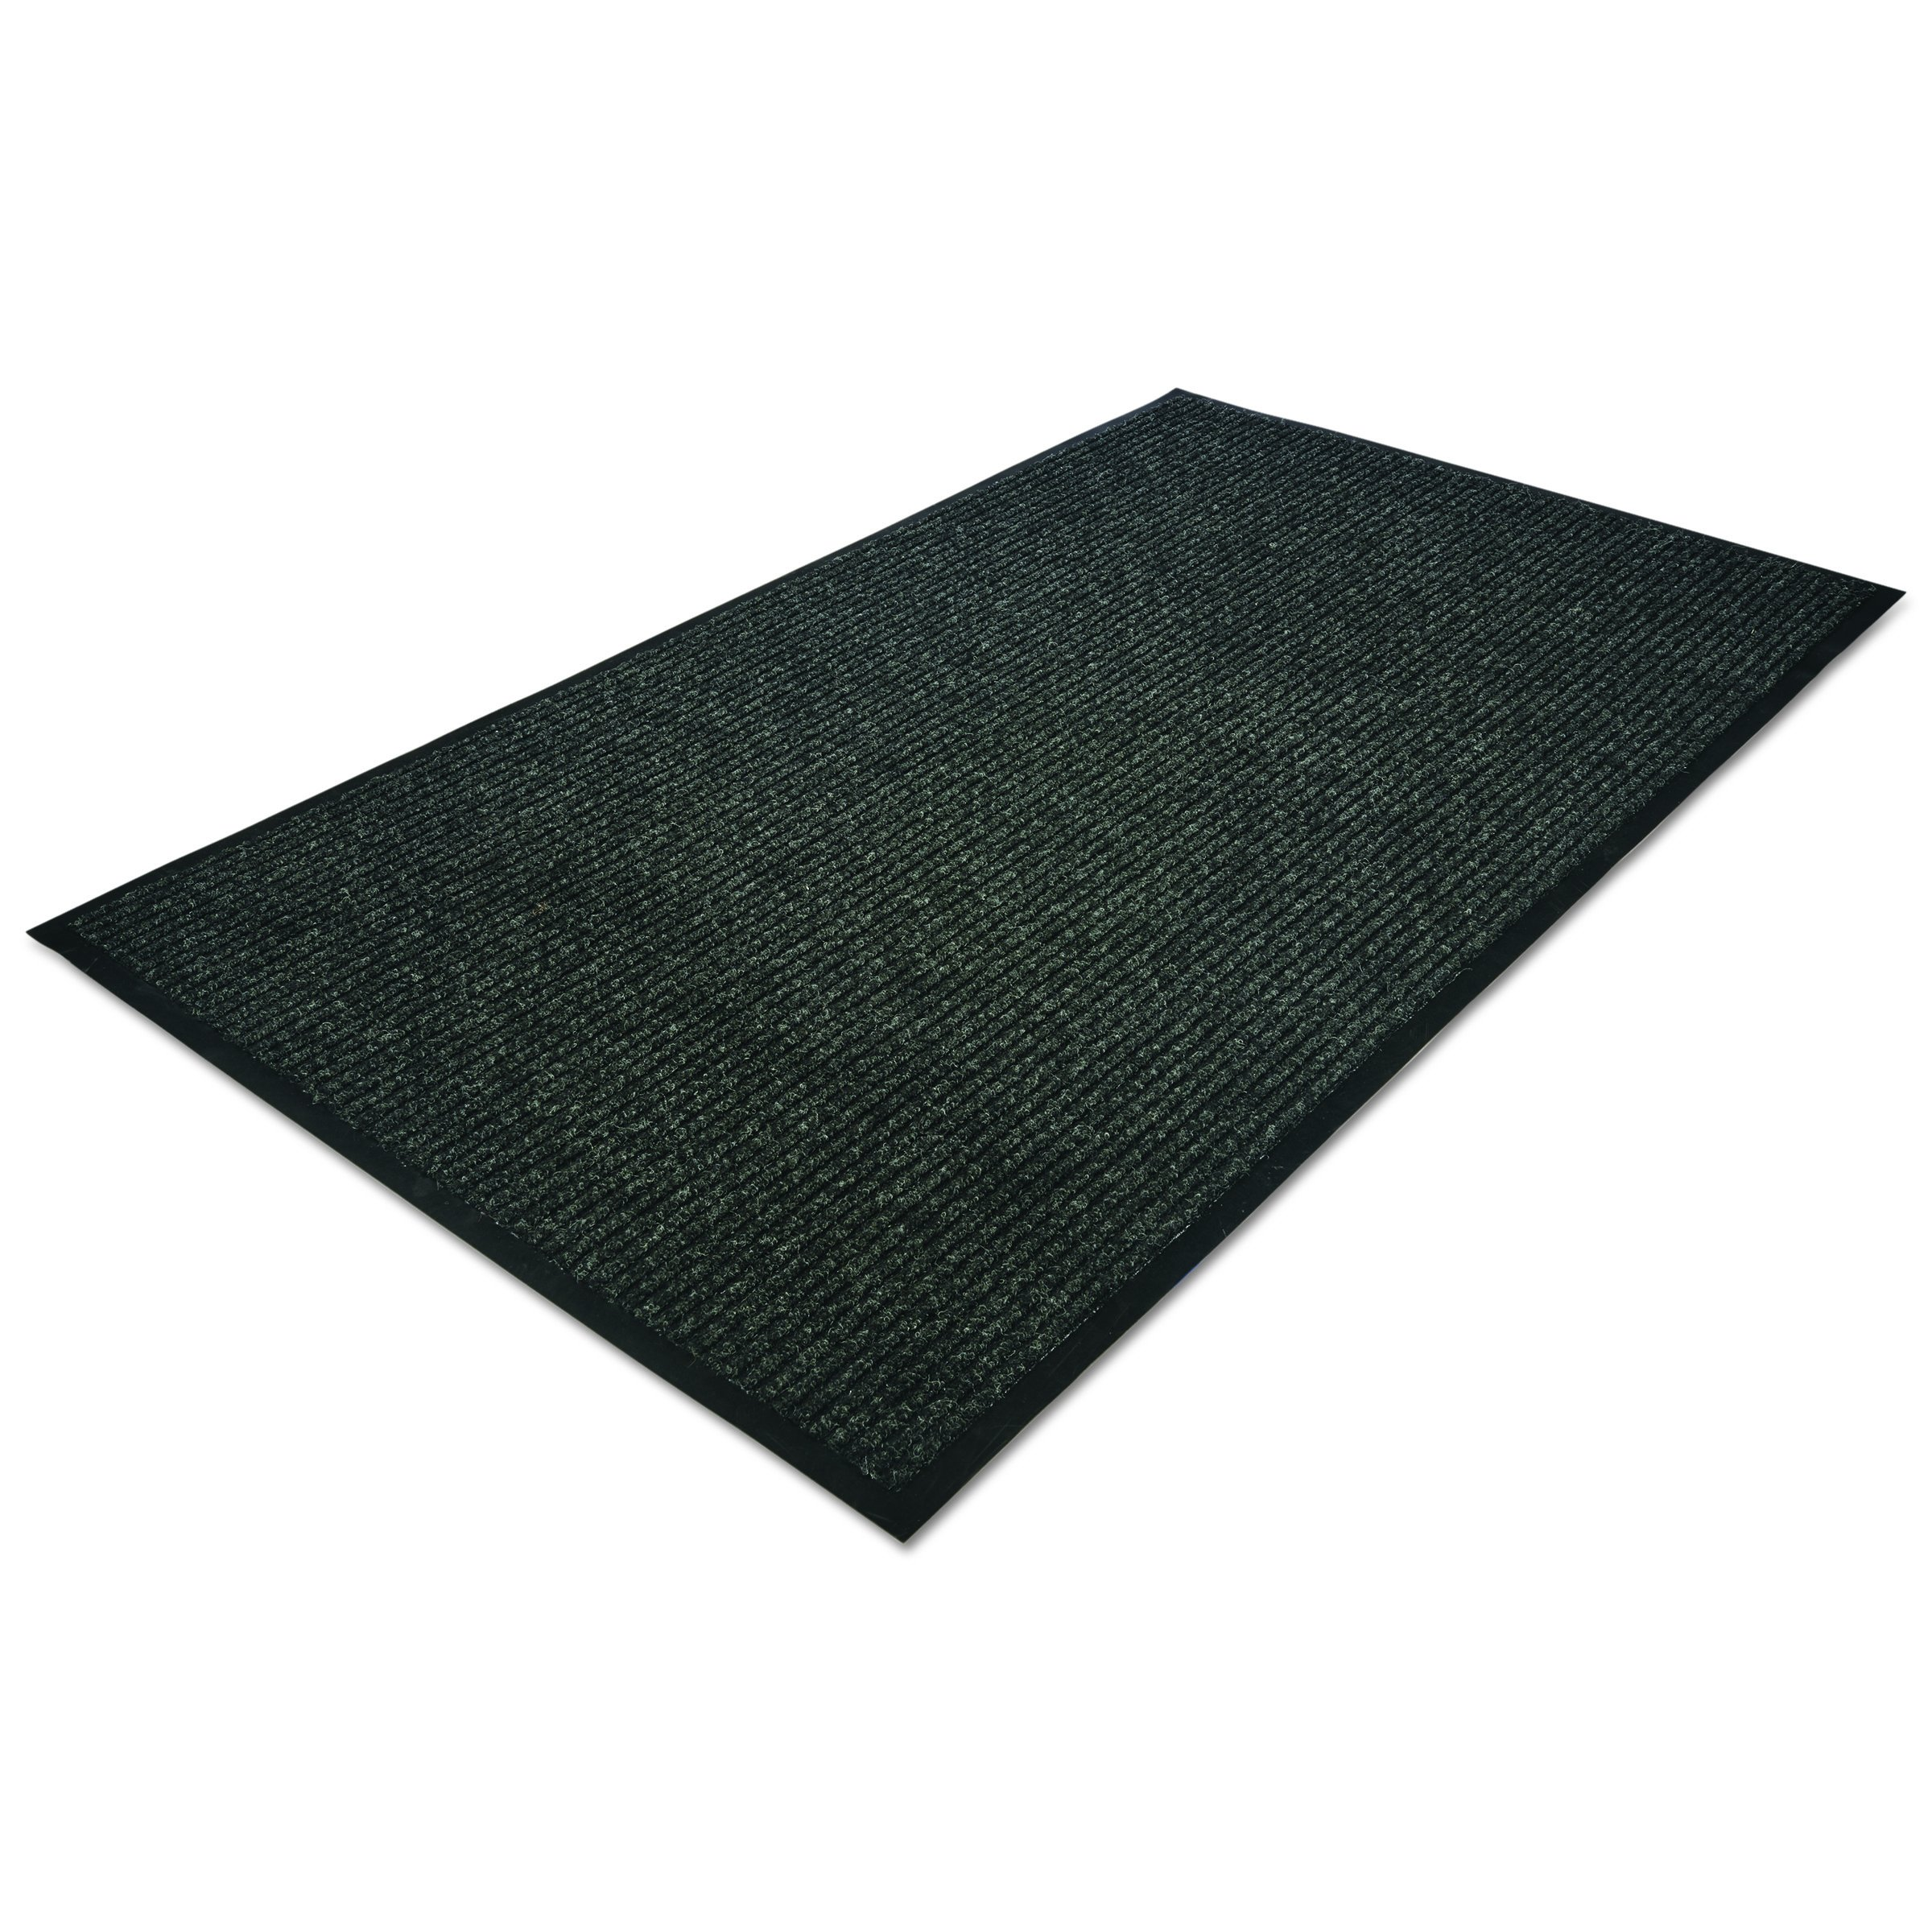 Guardian 64030530 Golden Series Indoor Wiper Mat Polypropylene 36 x 60 Charcoal, 36 x 60, Charcoal